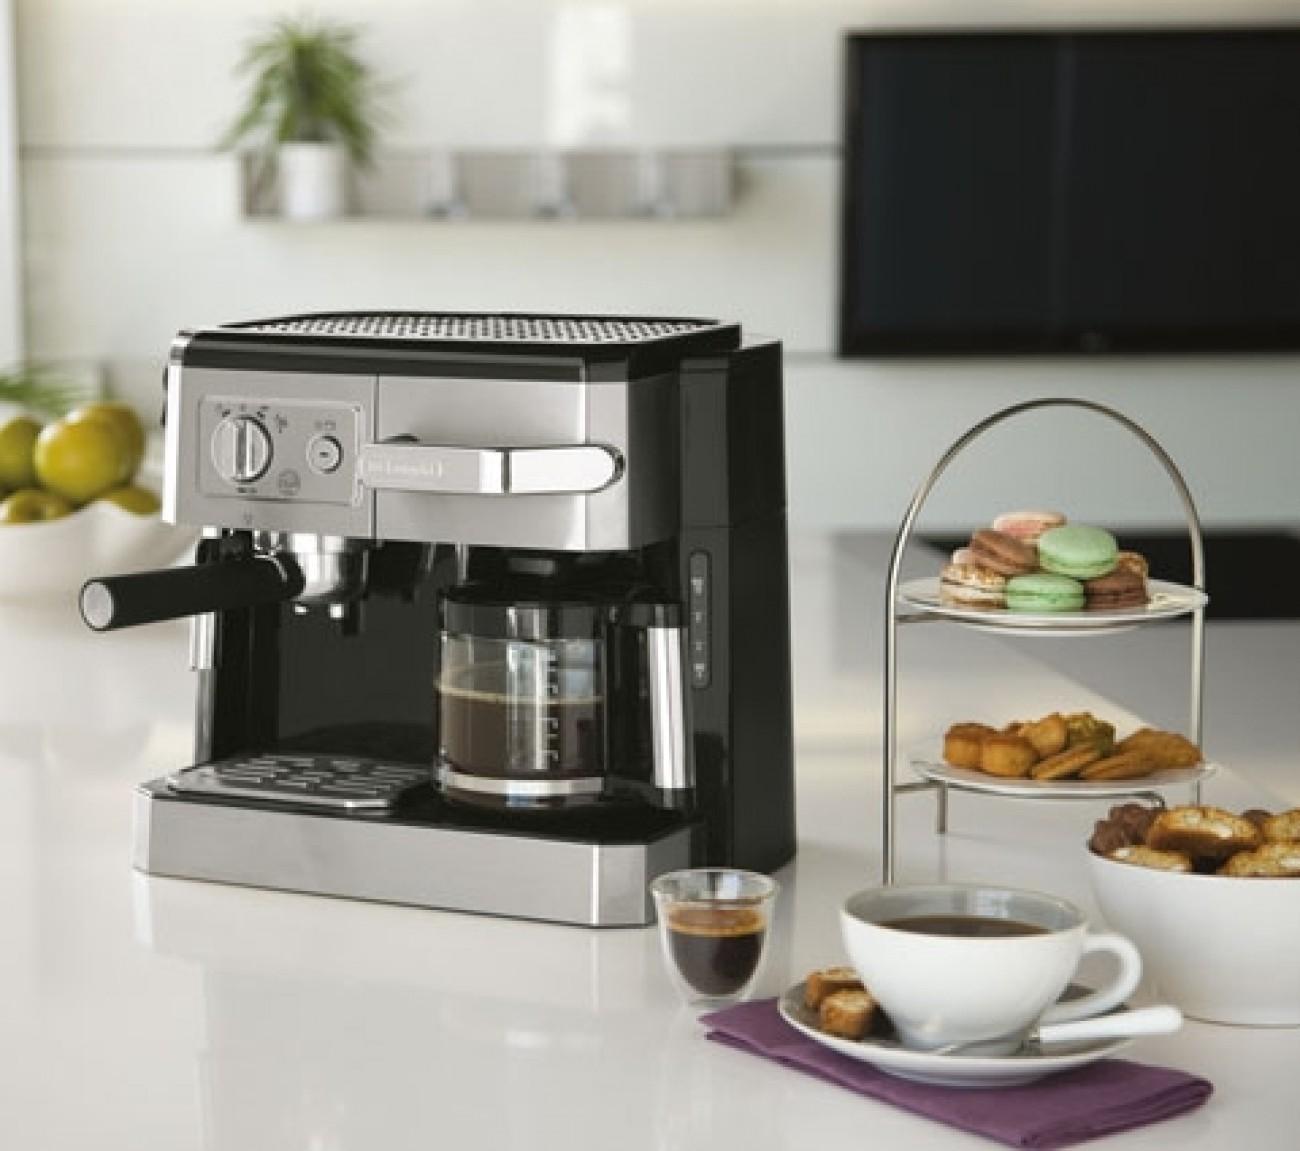 delonghi bco 420 1 kombi espresso kaffeemaschine schwarz silber. Black Bedroom Furniture Sets. Home Design Ideas